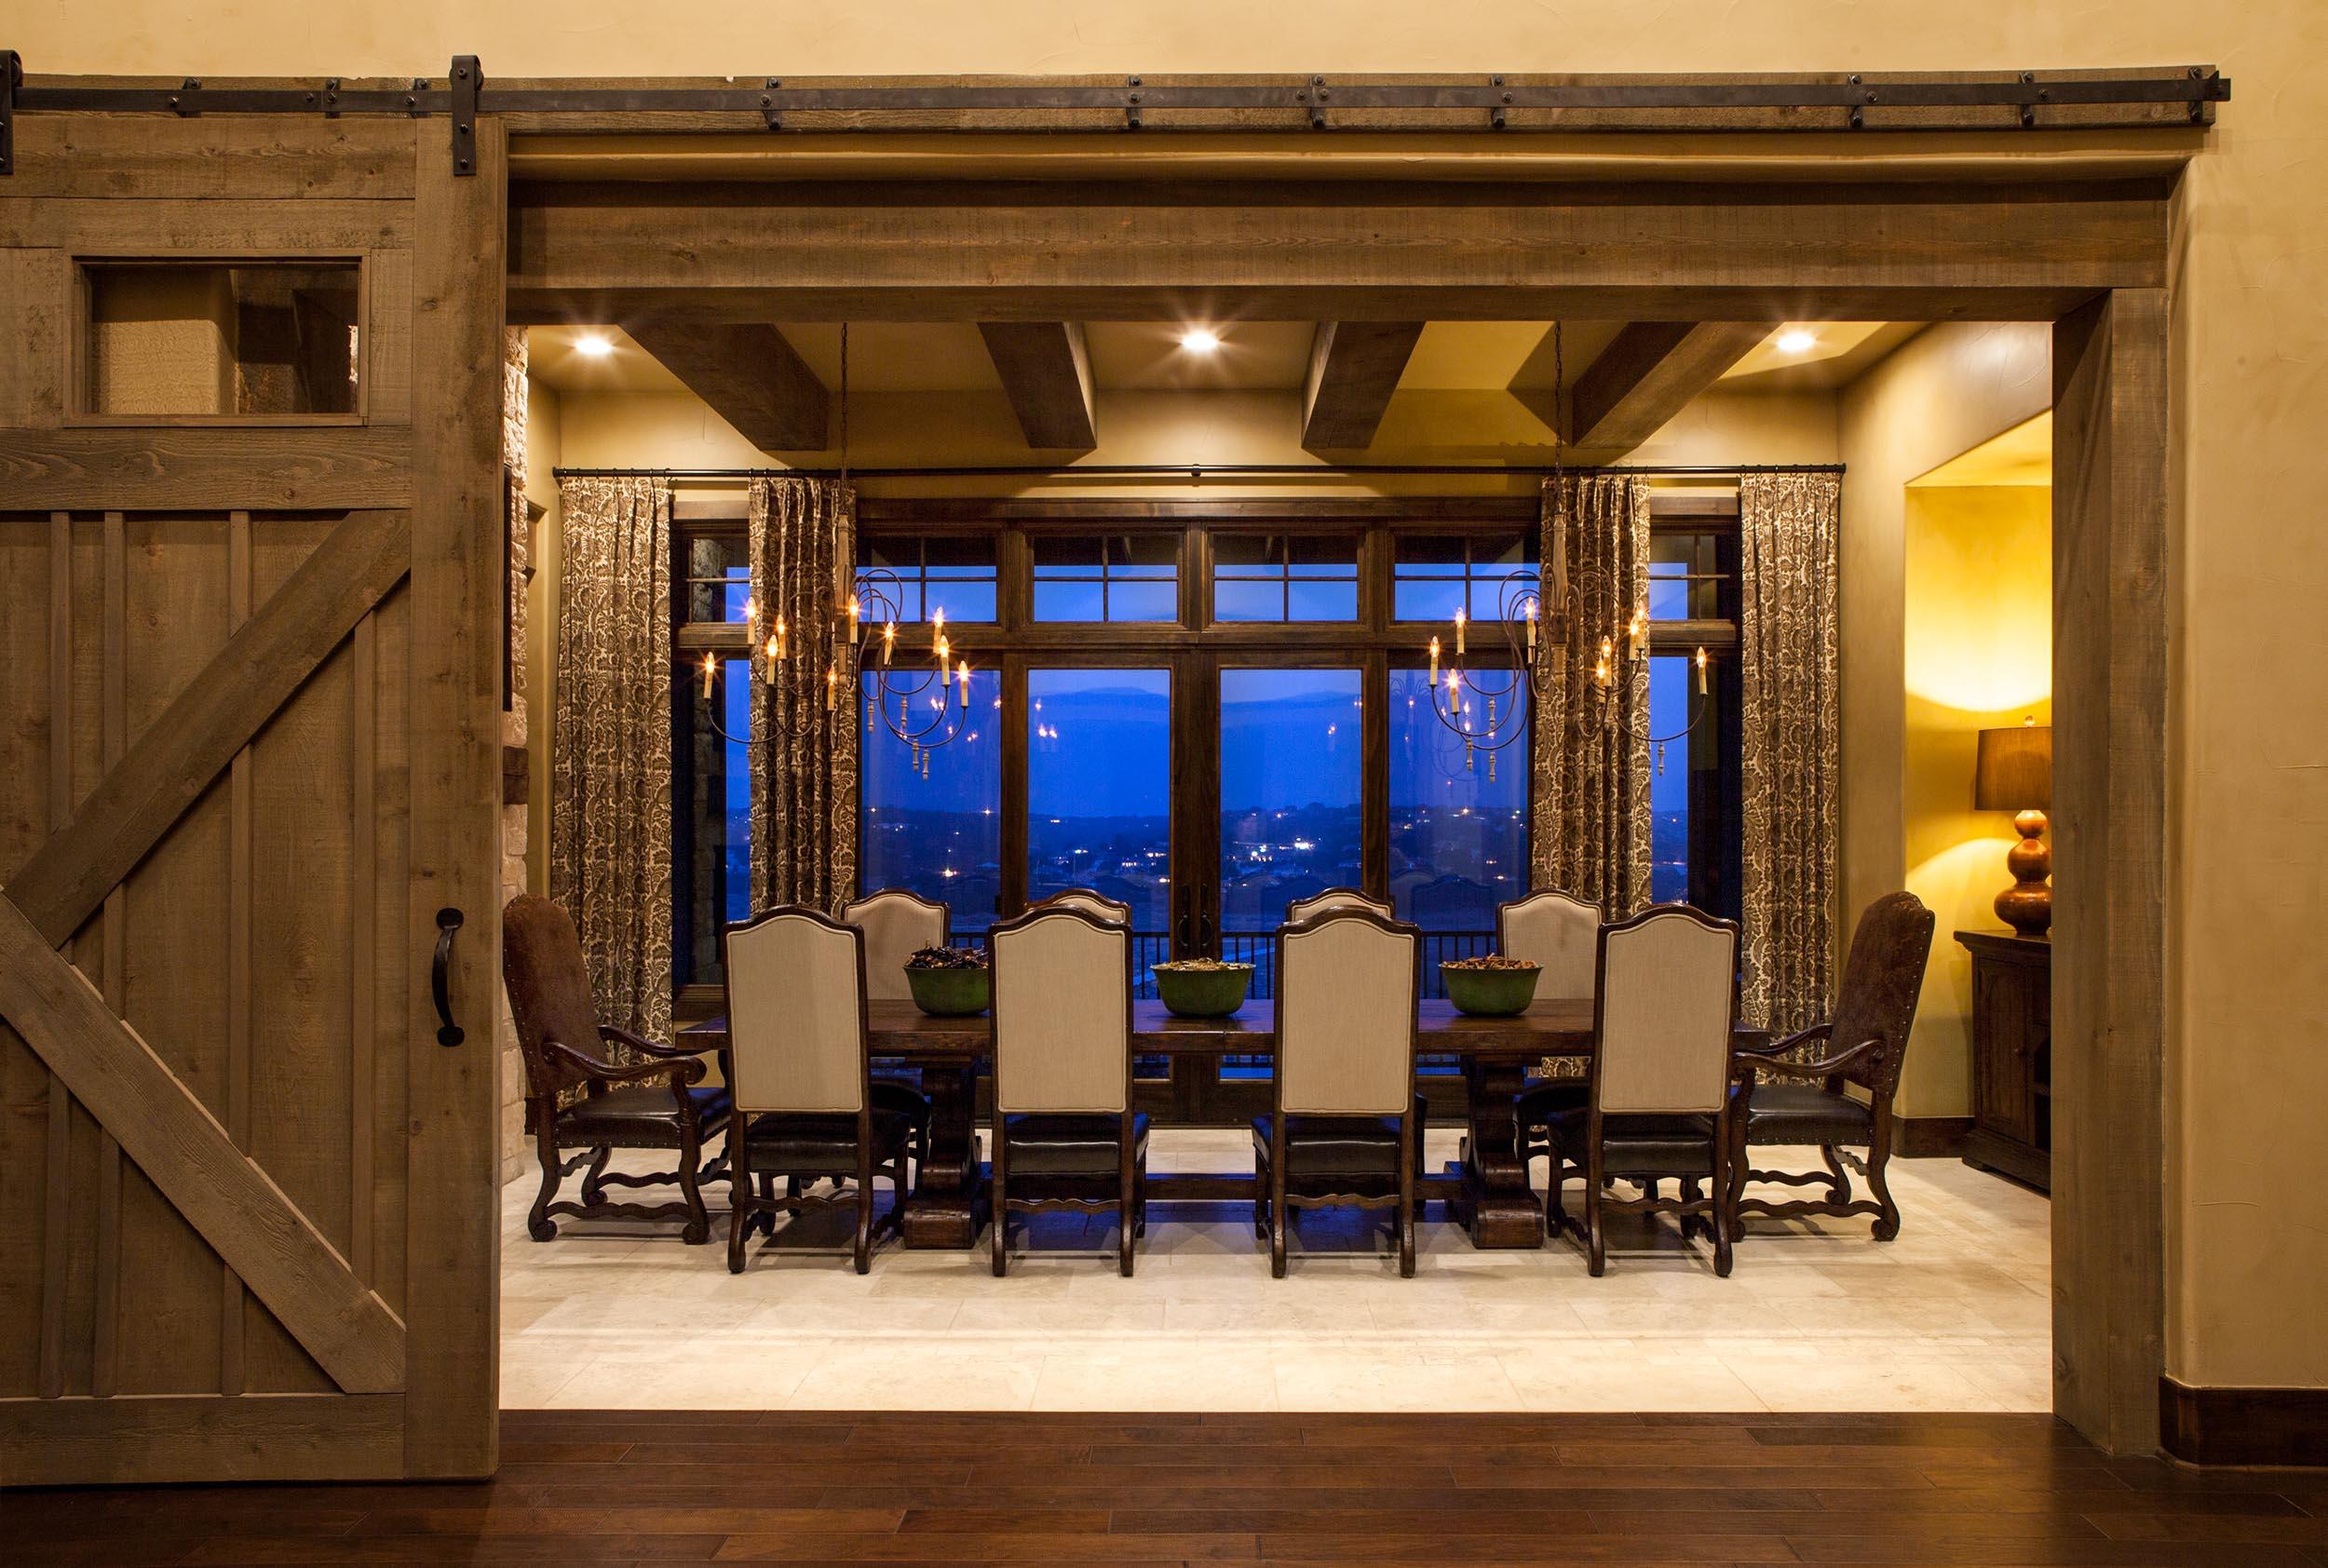 austin-house-dining-room-2-interior-design.jpg